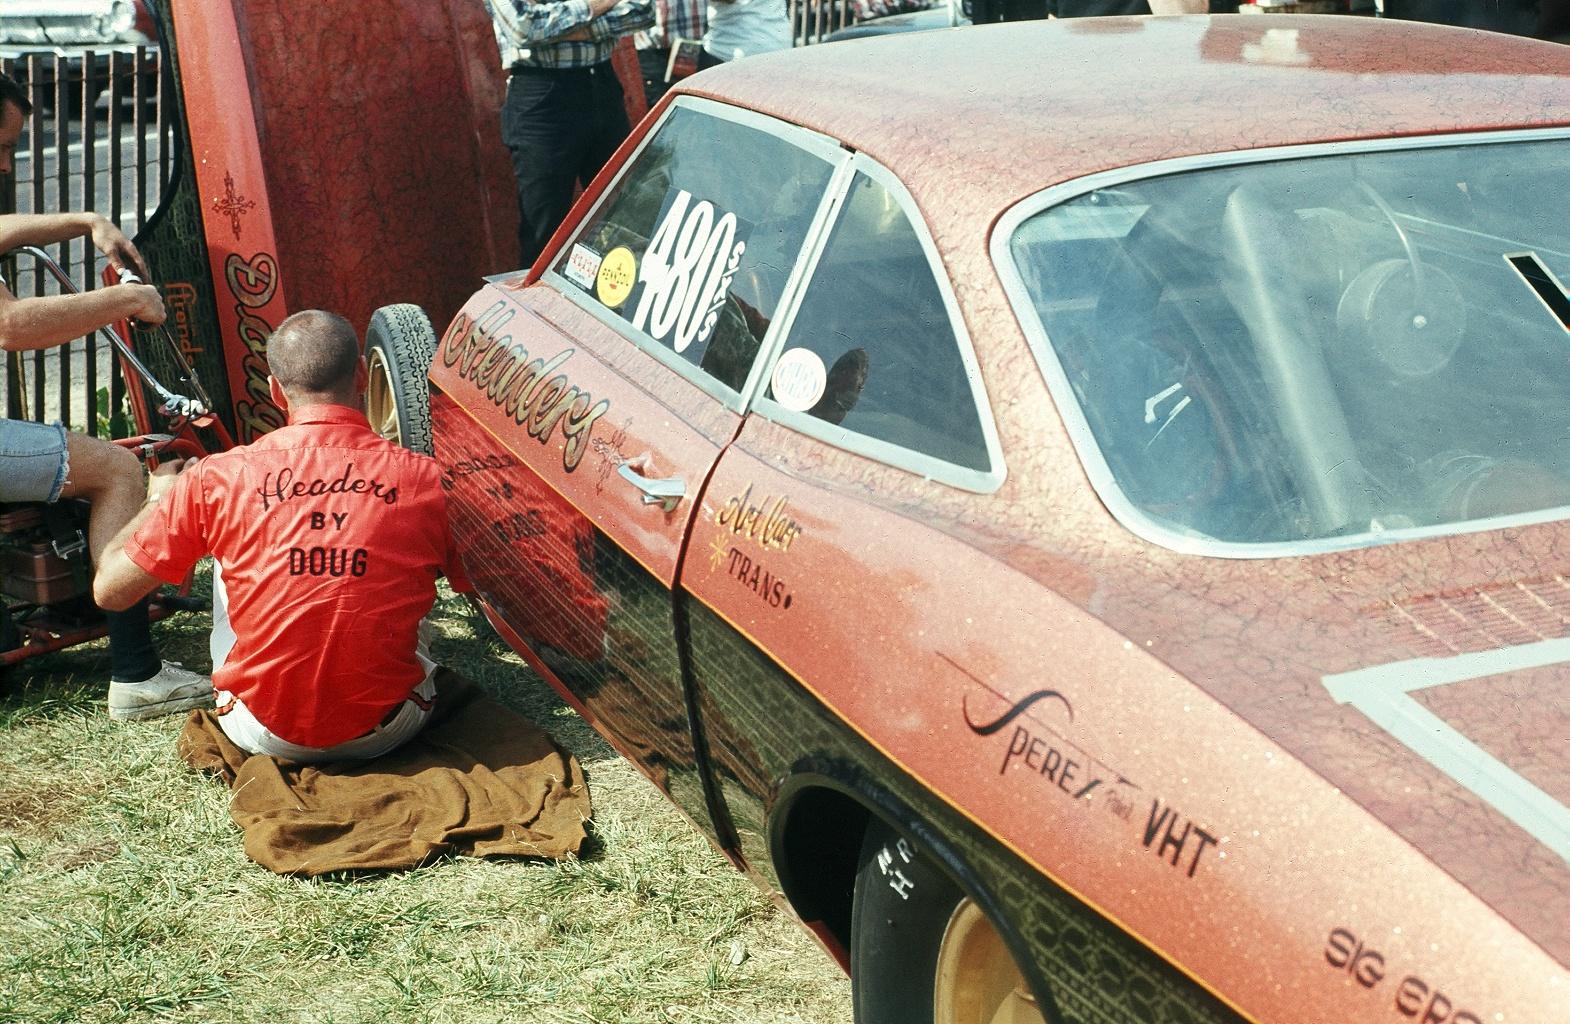 macs cars Picture 311.jpg